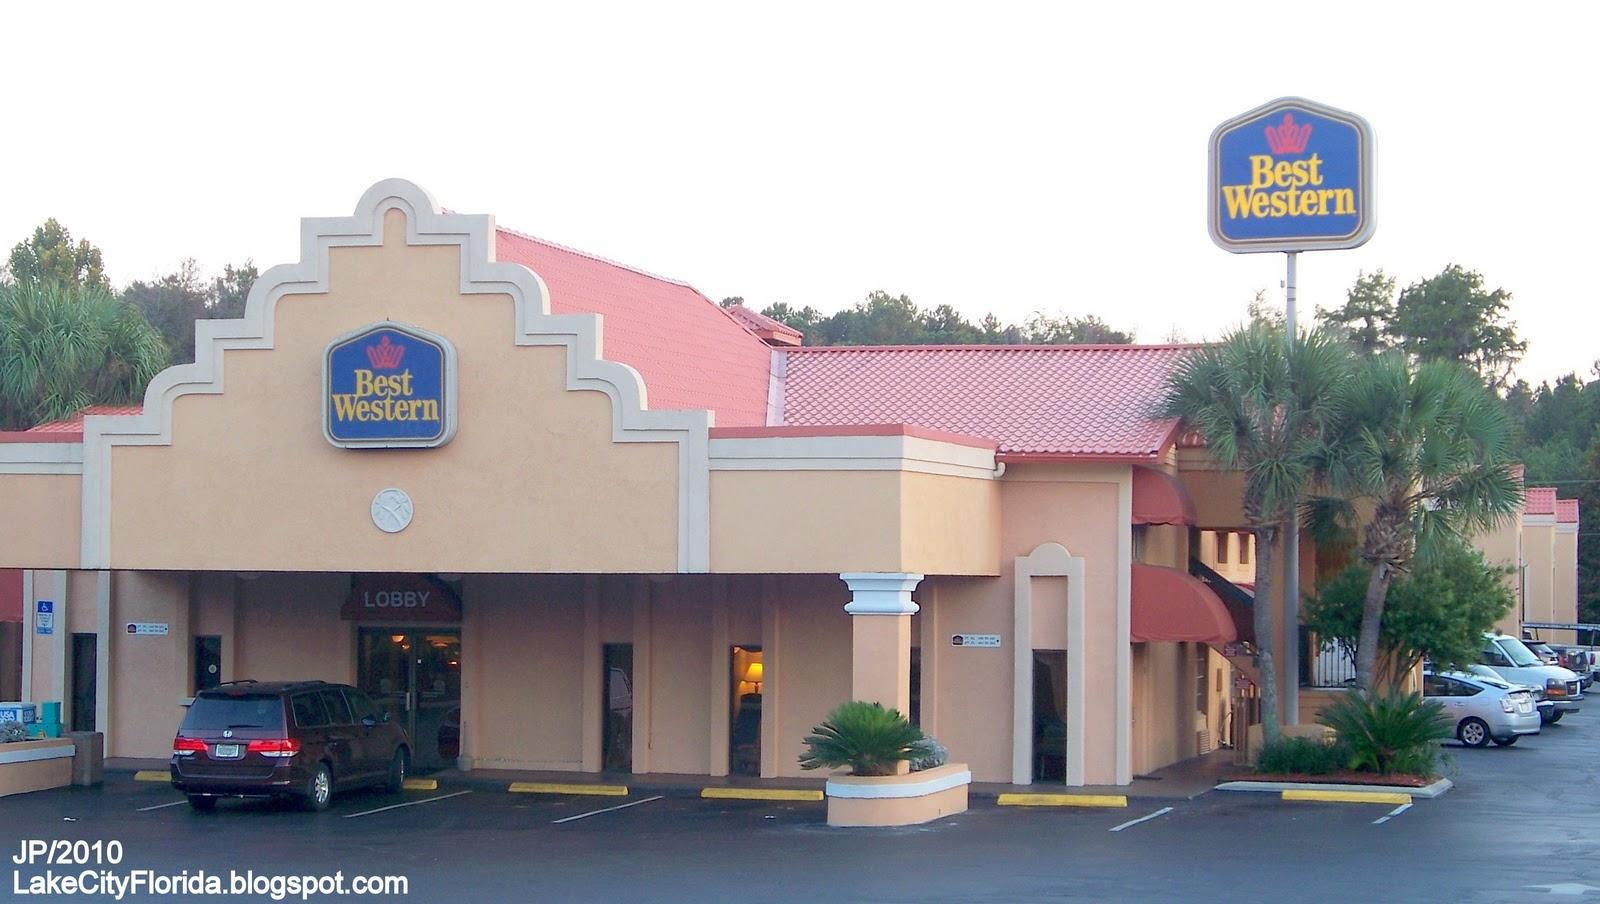 Lake City Florida Columbia Restaurant Attorney Bank Hotel Dr Rh Lakecityflorida Blo Com Hotels Fl Near I 75 That